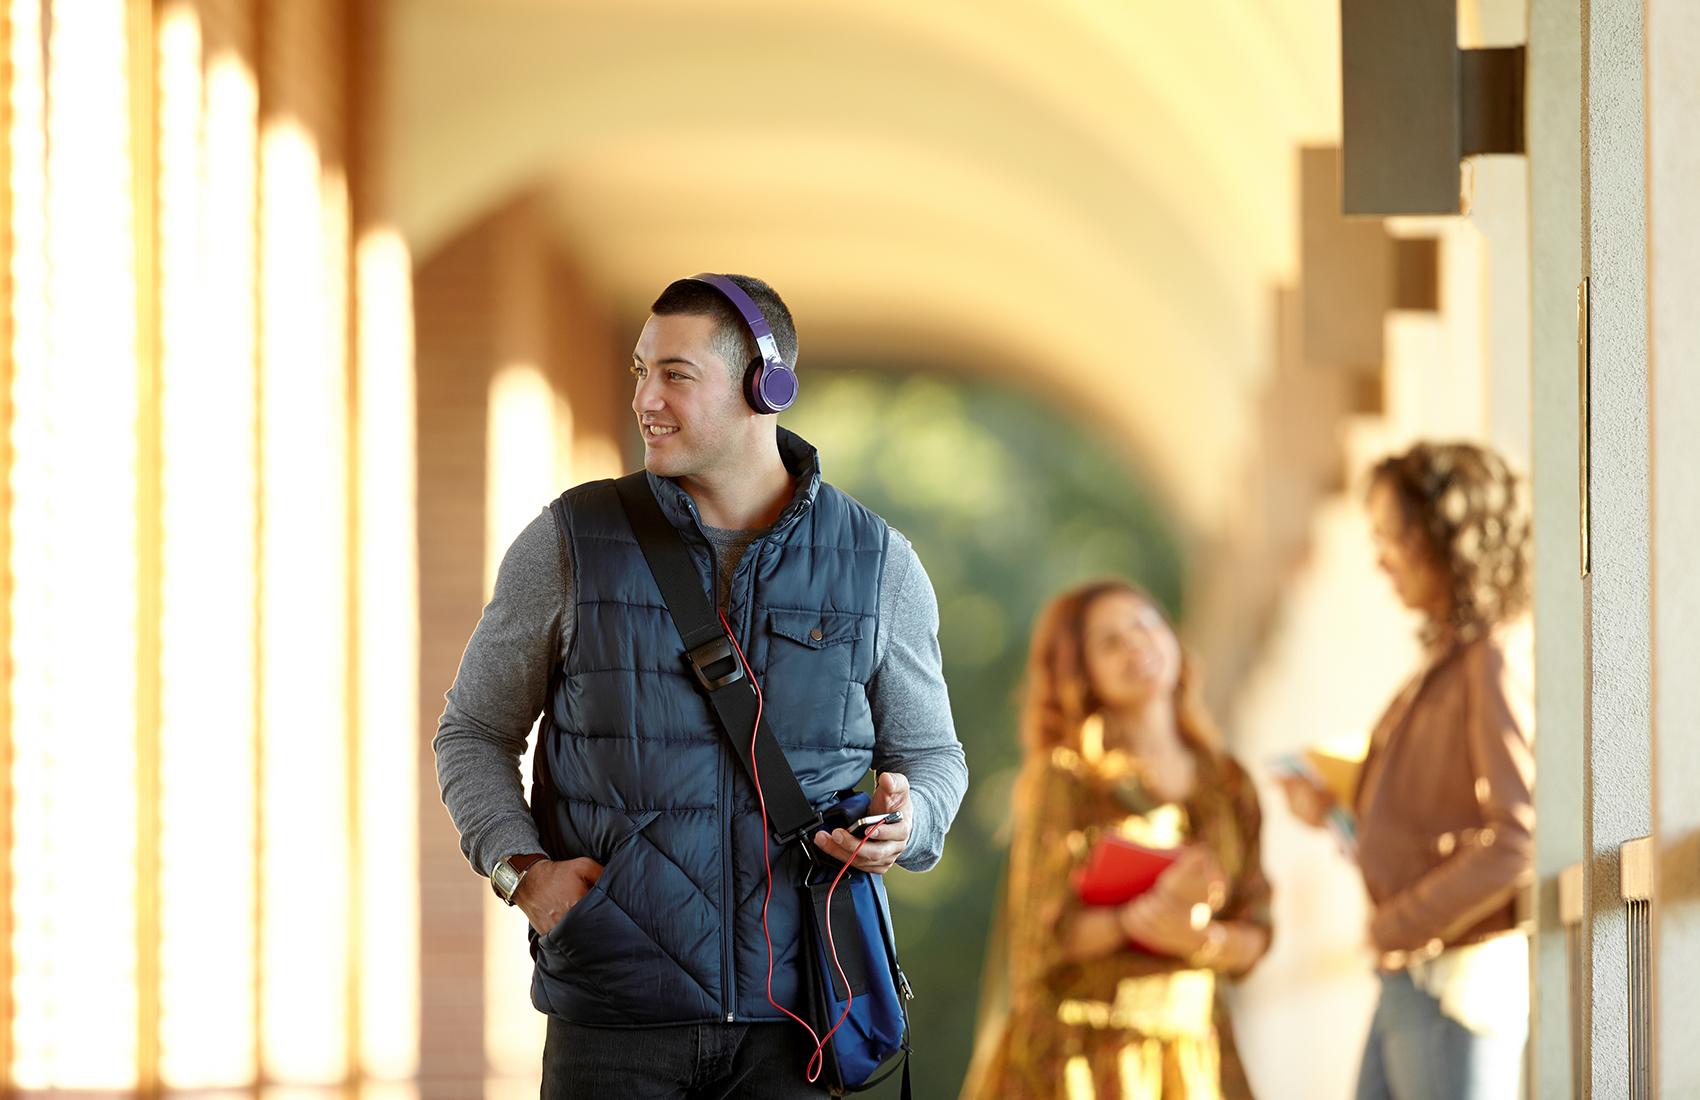 Male student walking down a campus breezeway